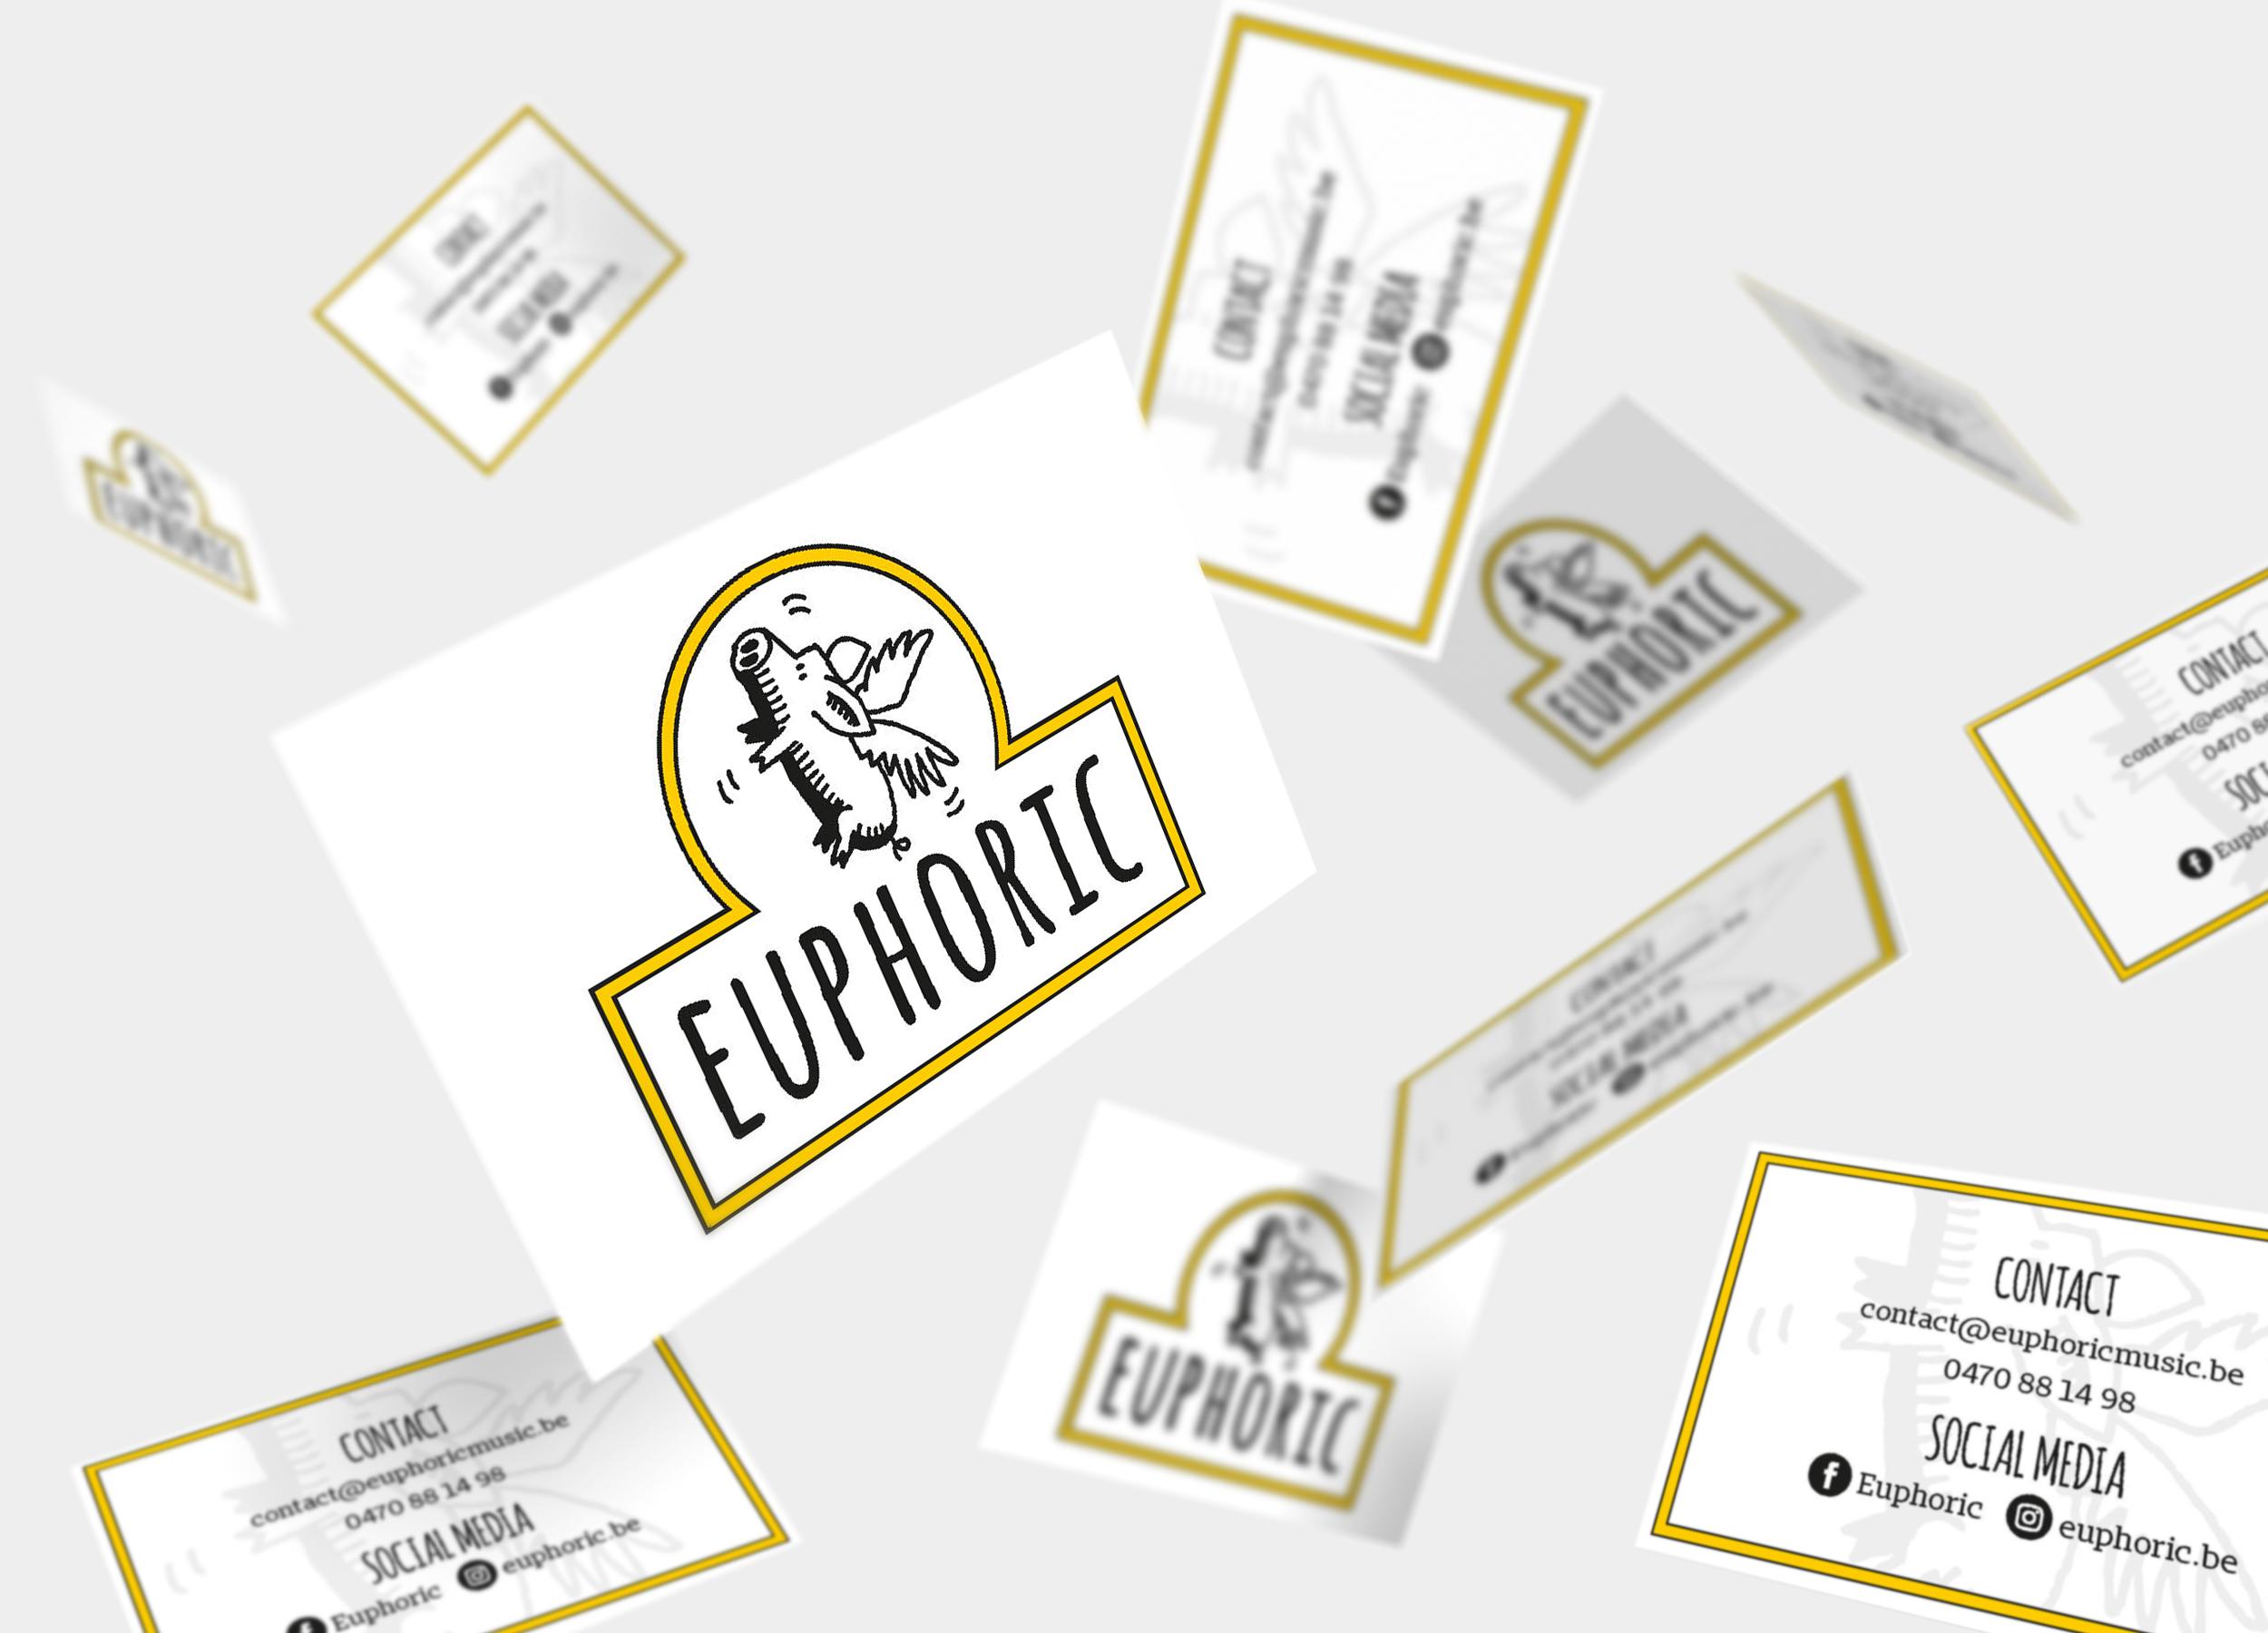 Business_Card_Mockup_2 Euphoric.jpg